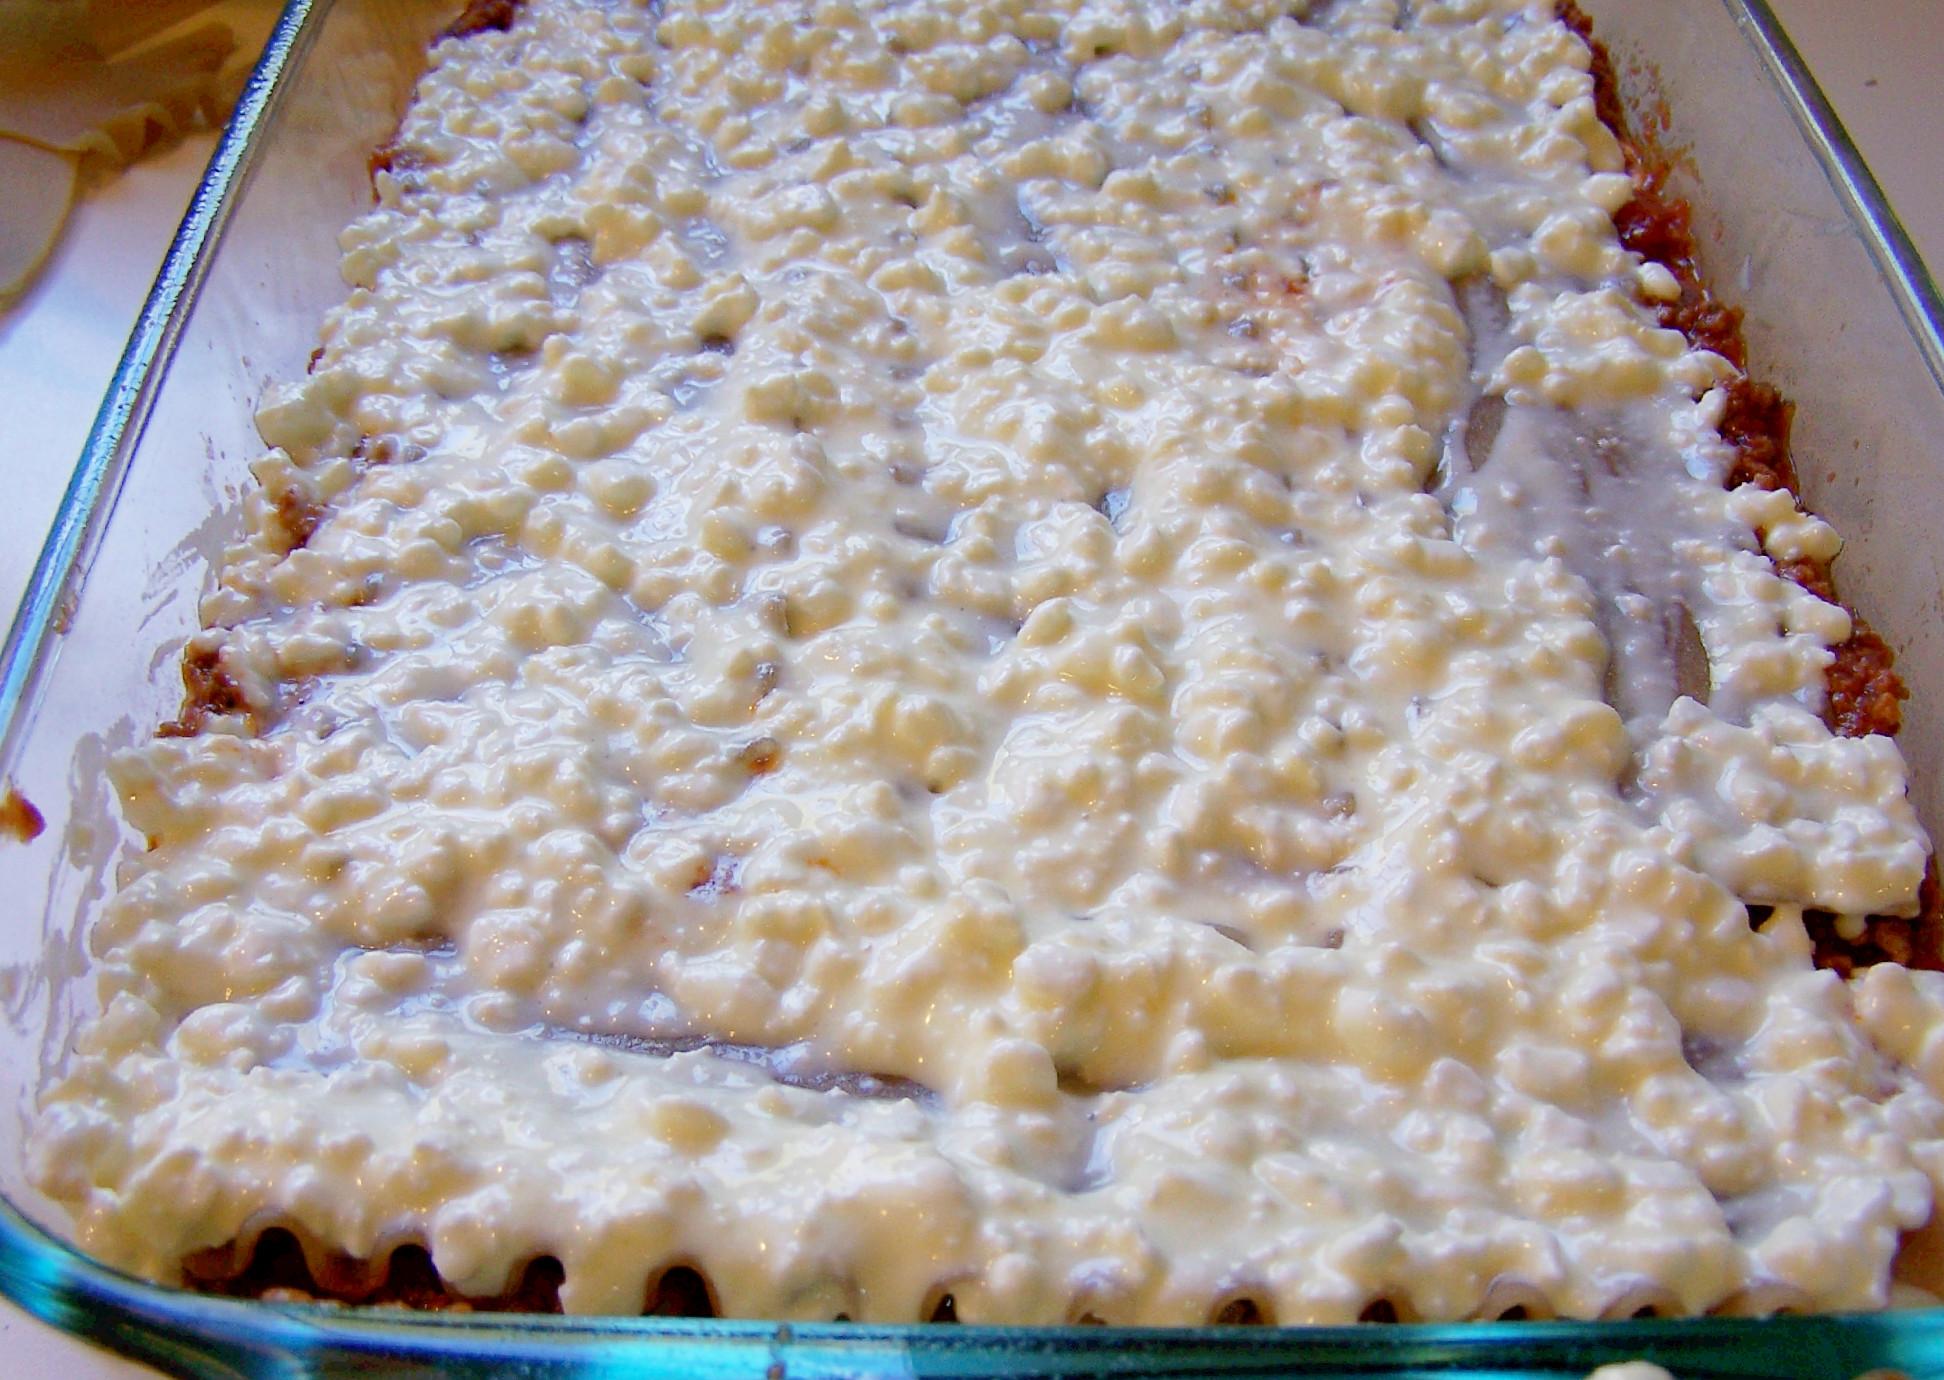 frozen homemade lasagna how to cook